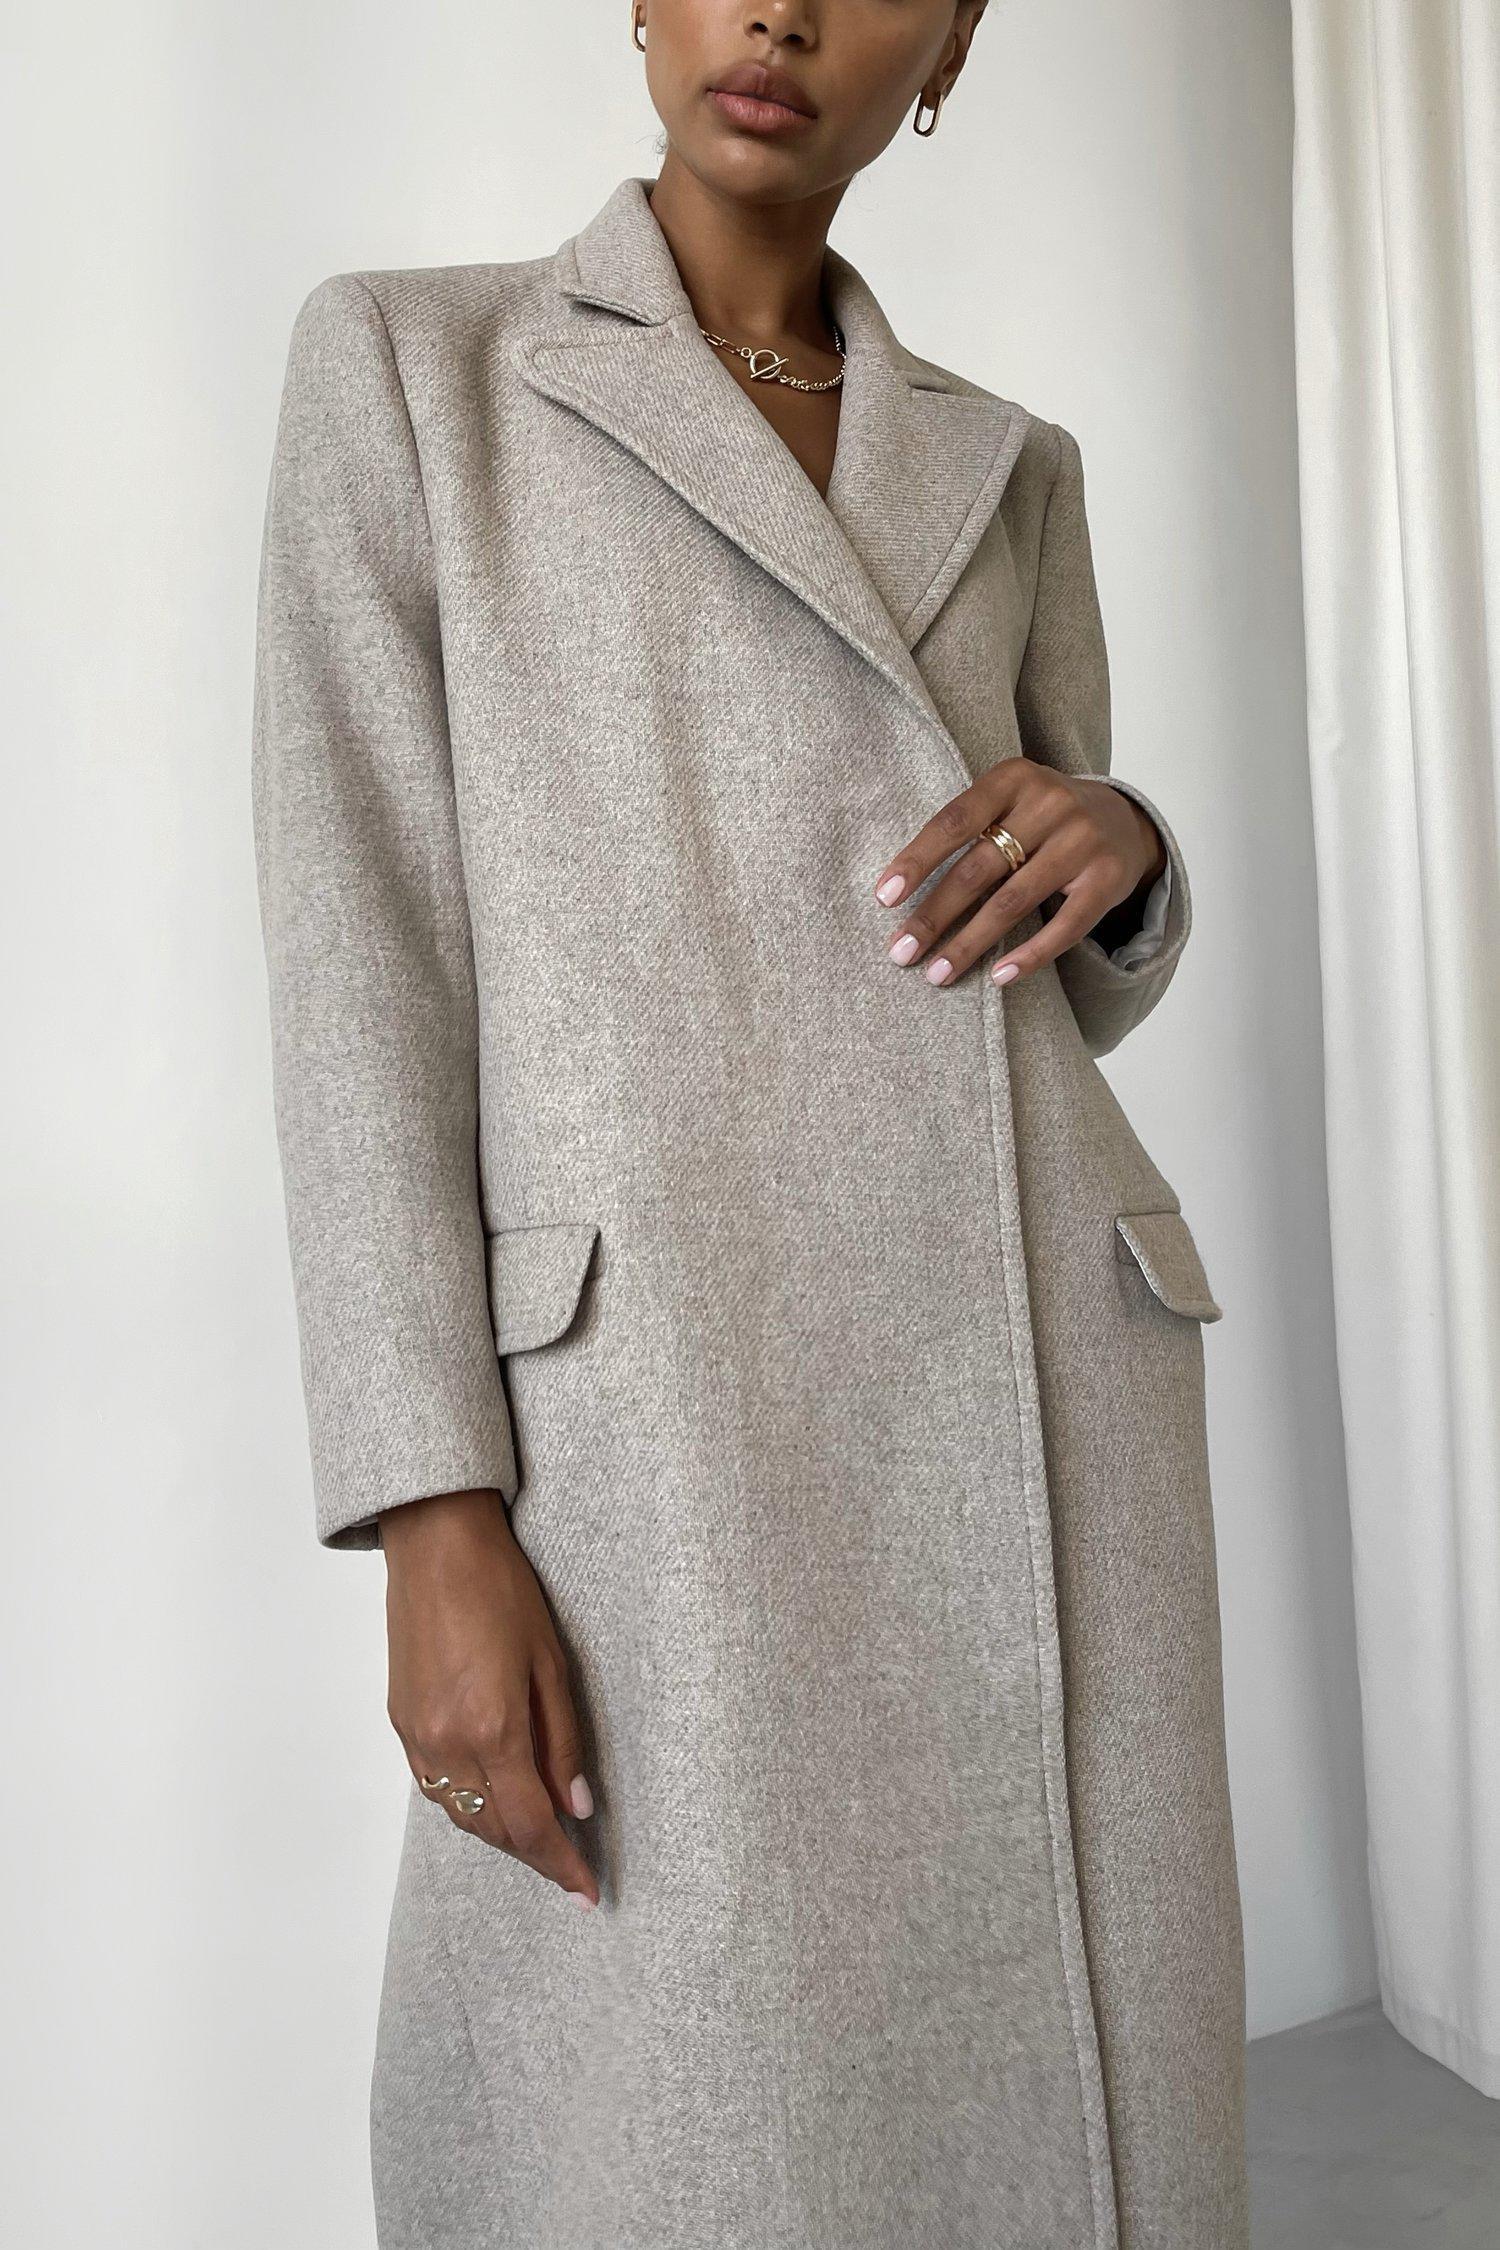 Пальто шерстяное оверсайз молочное - THE LACE